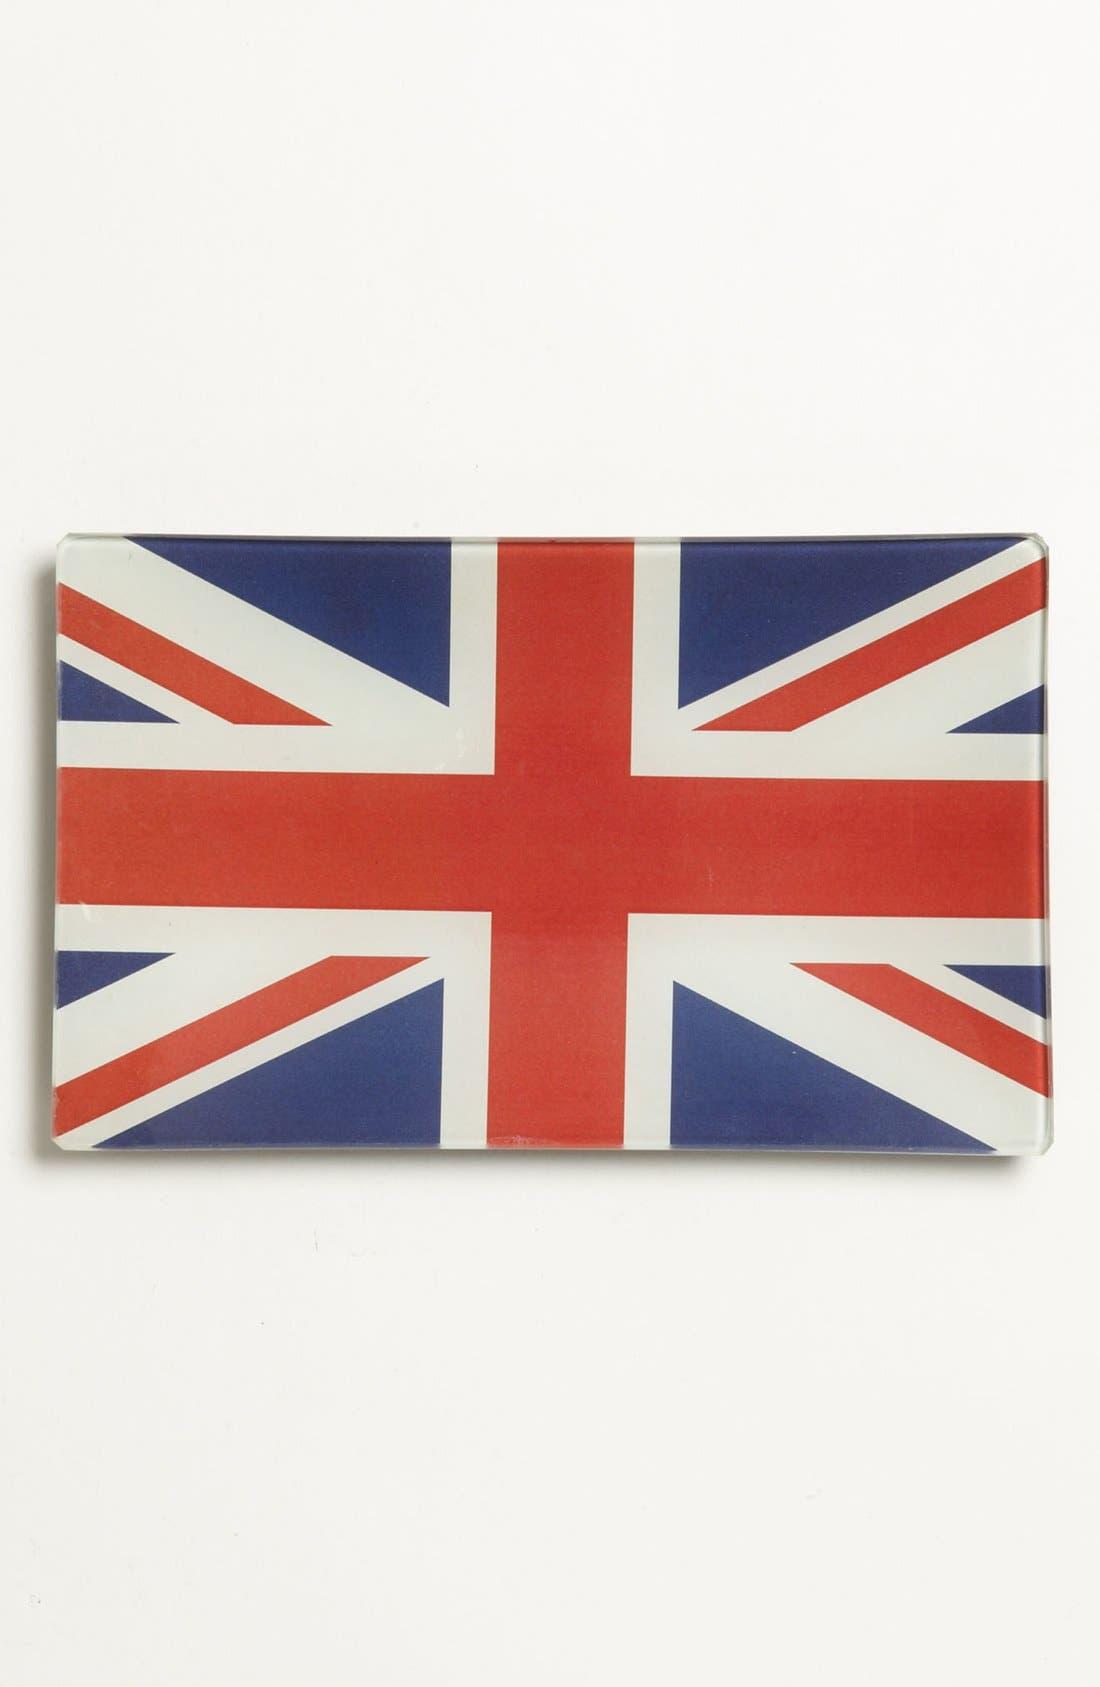 Alternate Image 1 Selected - Ben's Garden 'Union Jack' Trinket Tray